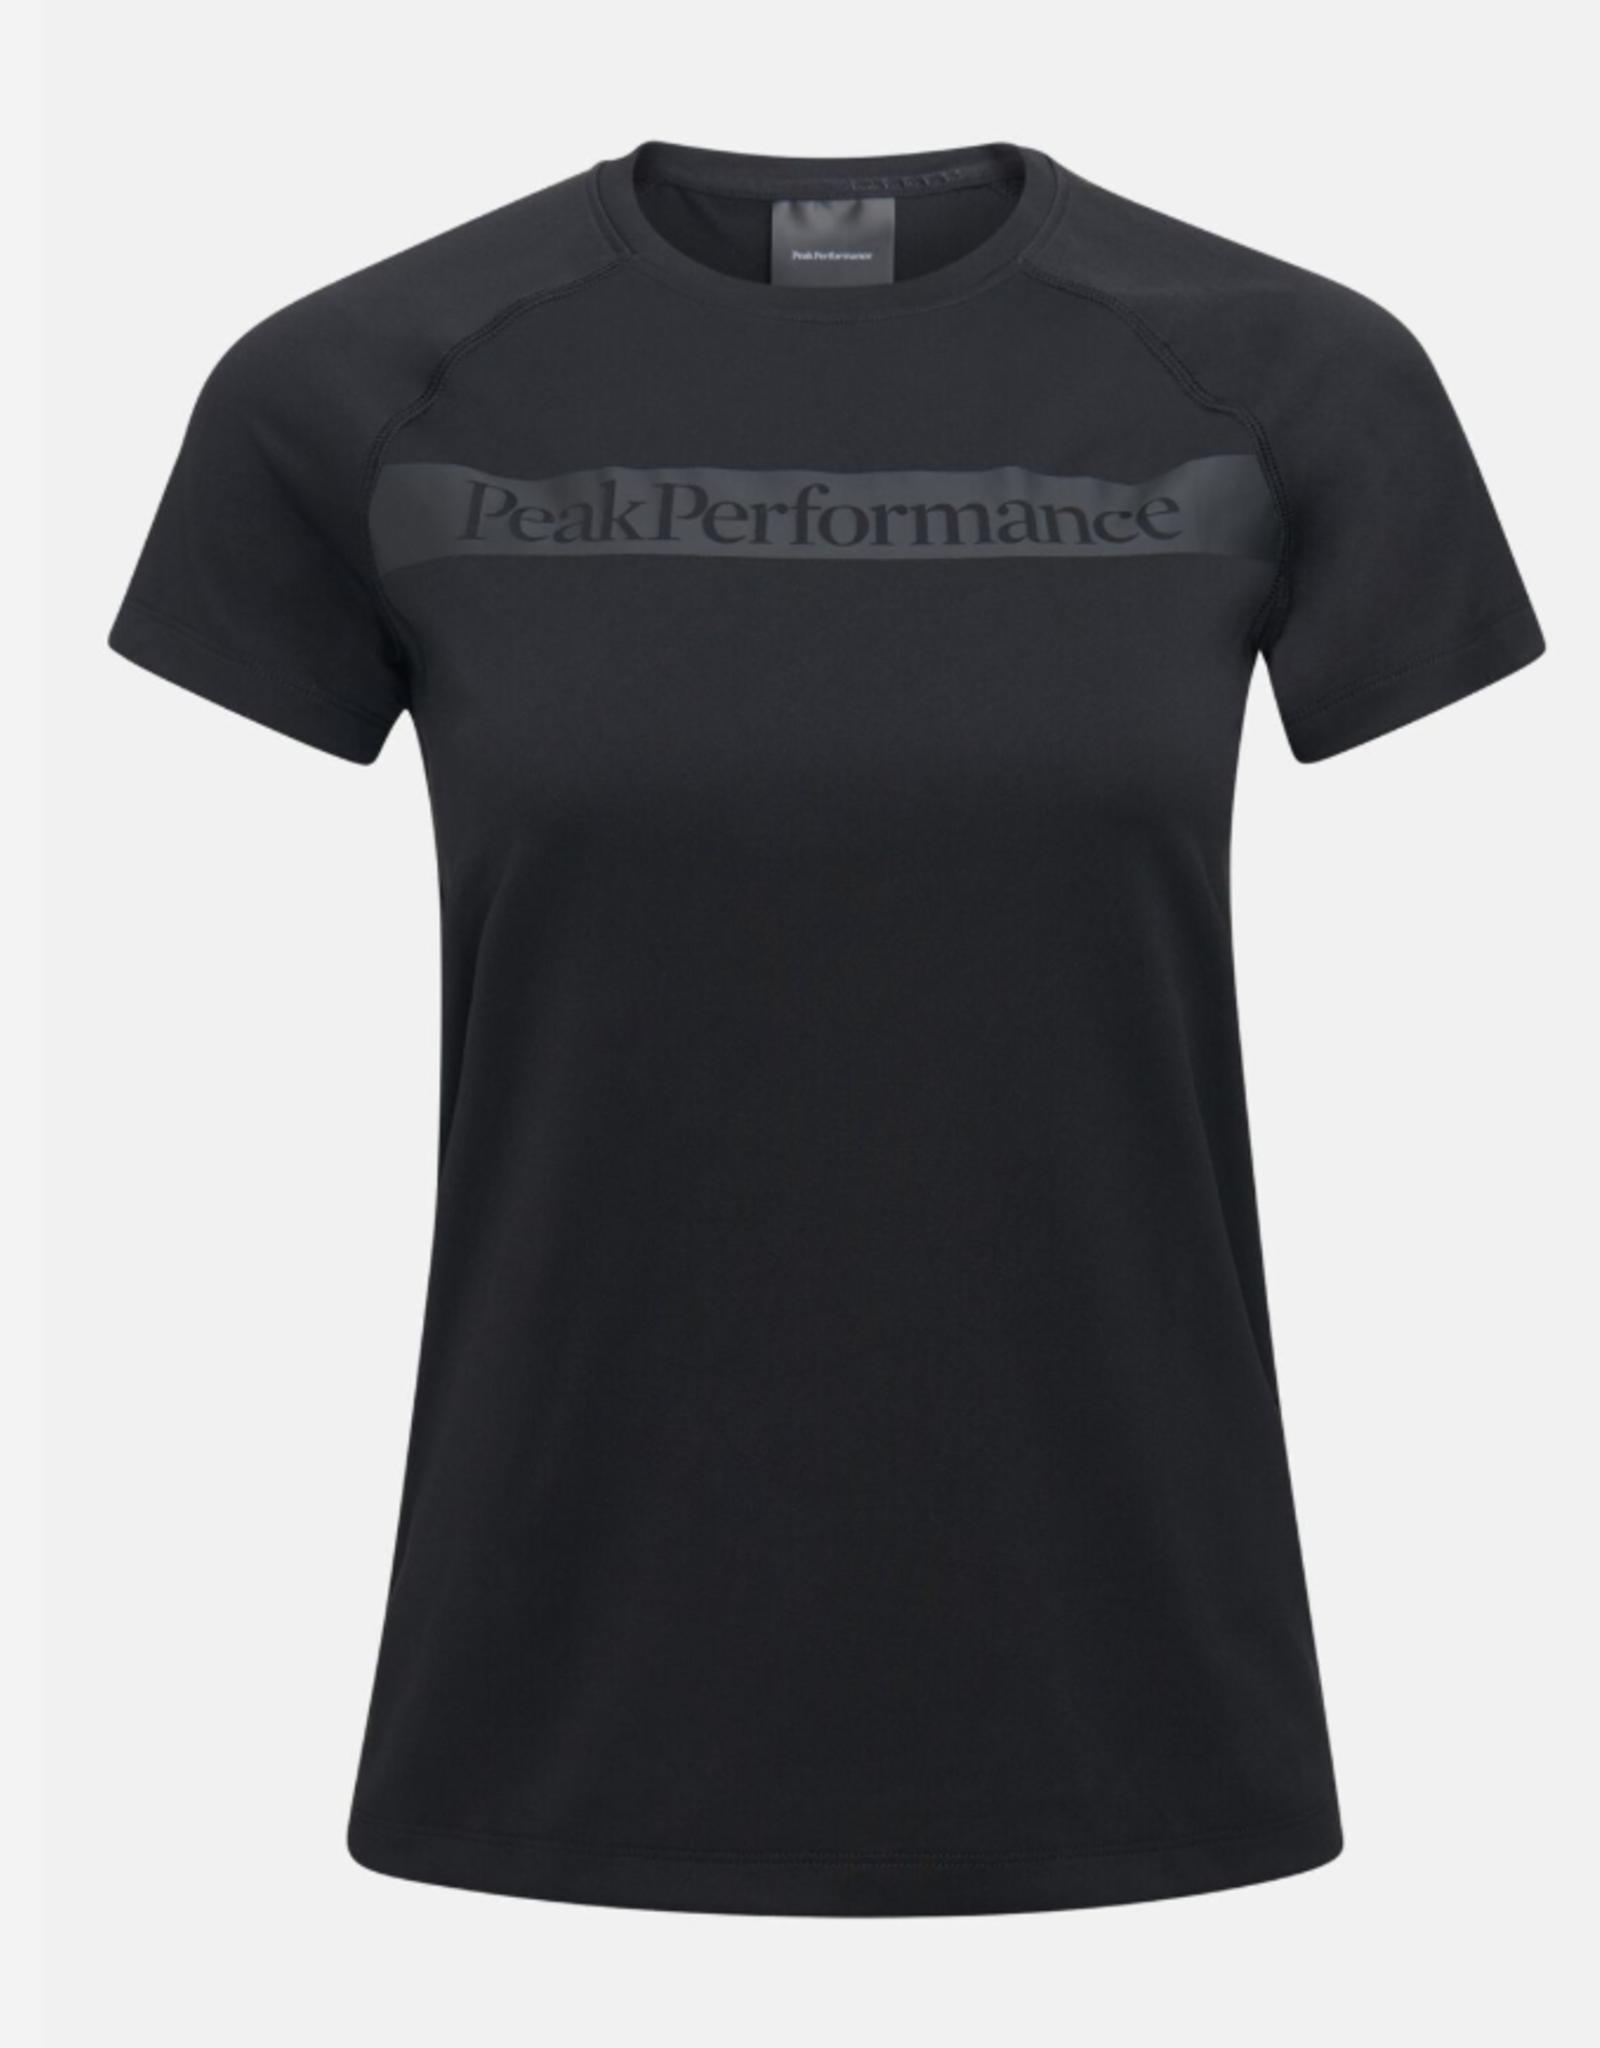 Peak Performance Pro CO2 Short sleeve dames t-shirt (G64014030)